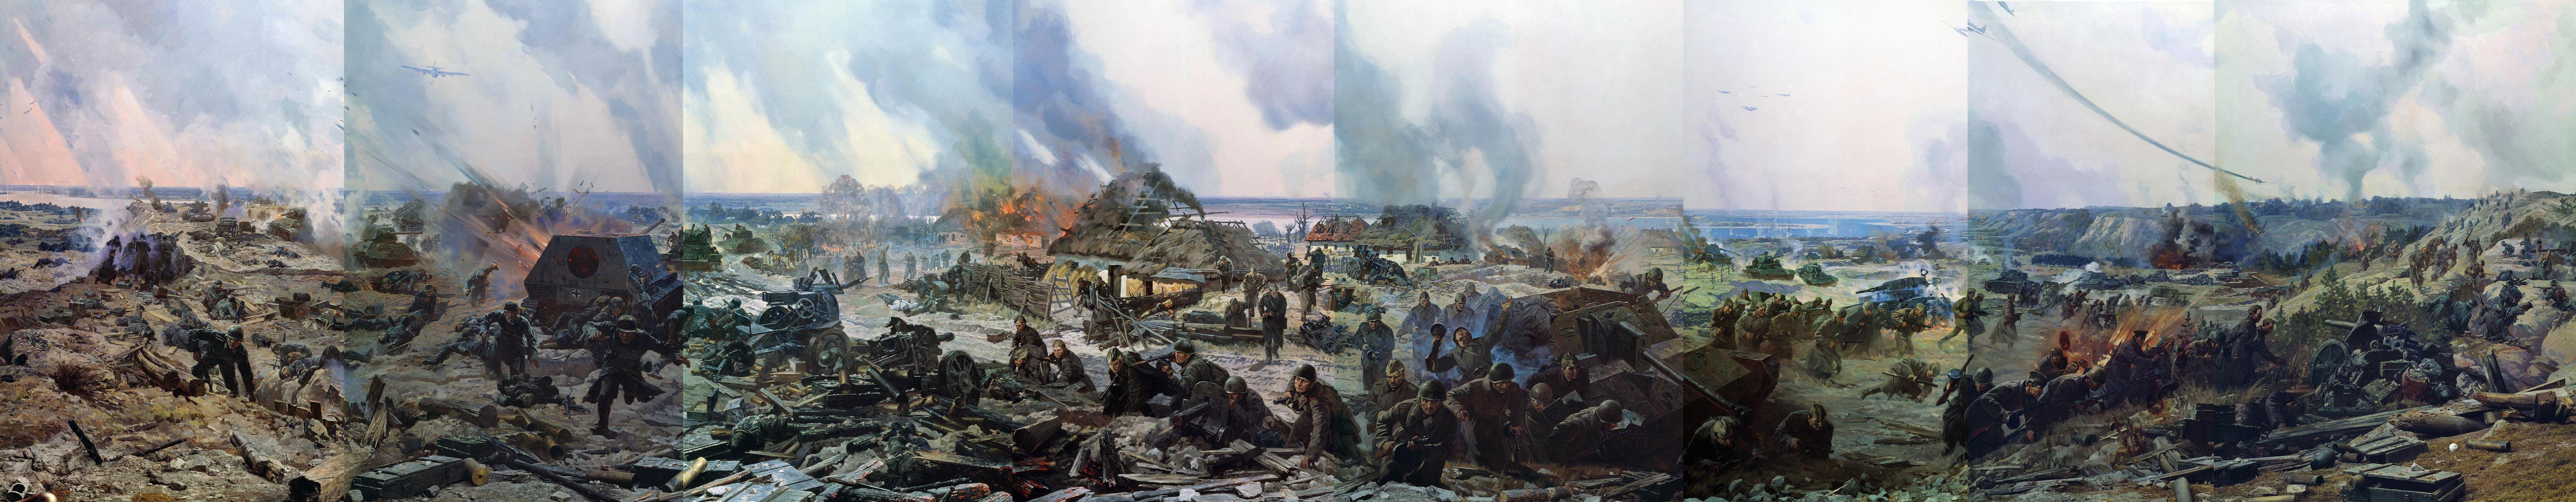 Присекин Николай. Диорама «Битва за Киев. Лютежский плацдарм. 1943 год».